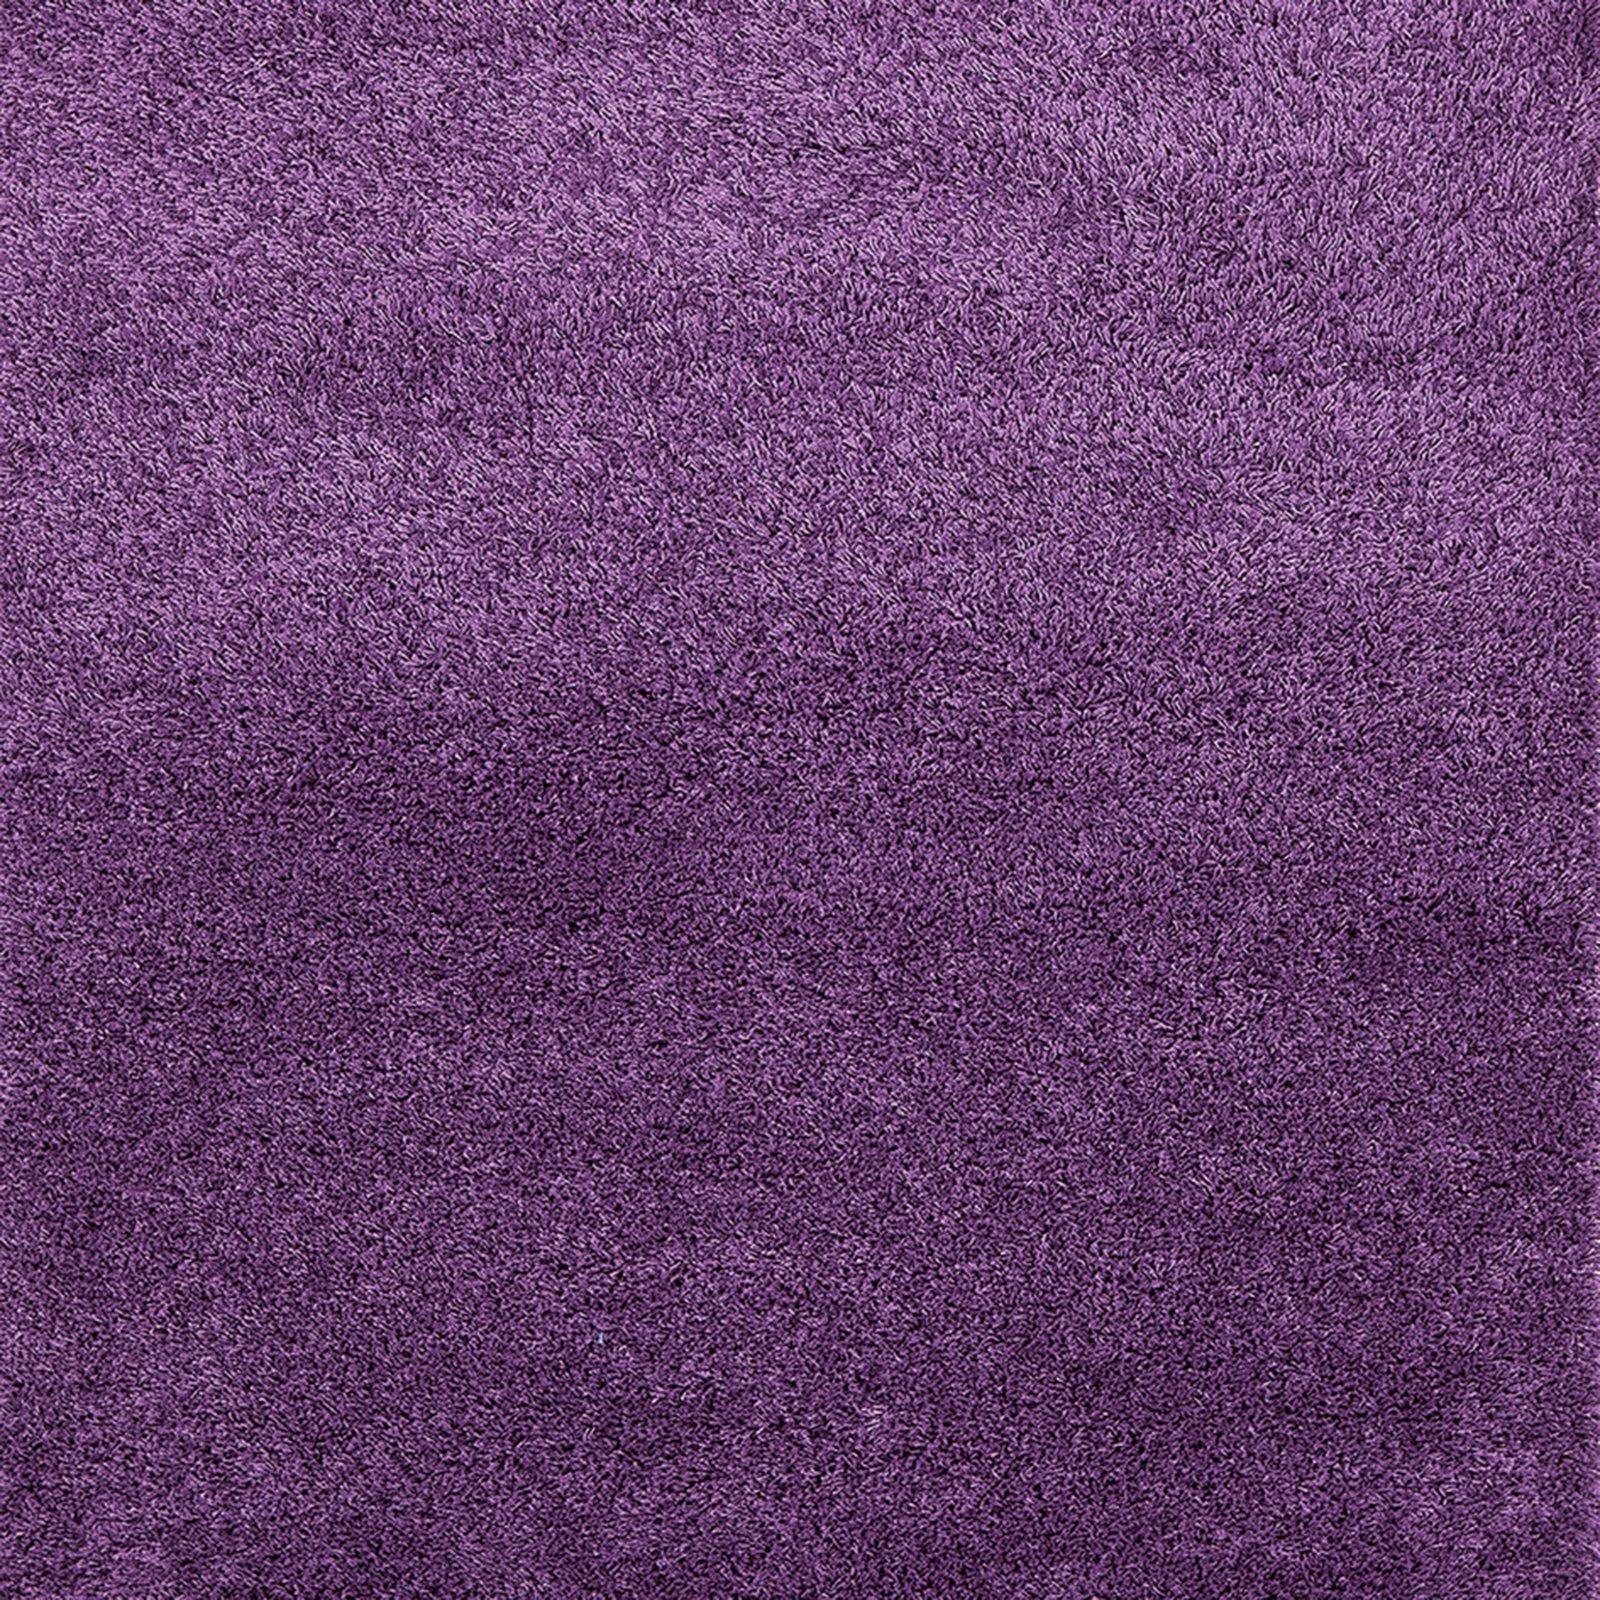 roller teppich shaggy plus lila 50x100 cm ebay. Black Bedroom Furniture Sets. Home Design Ideas